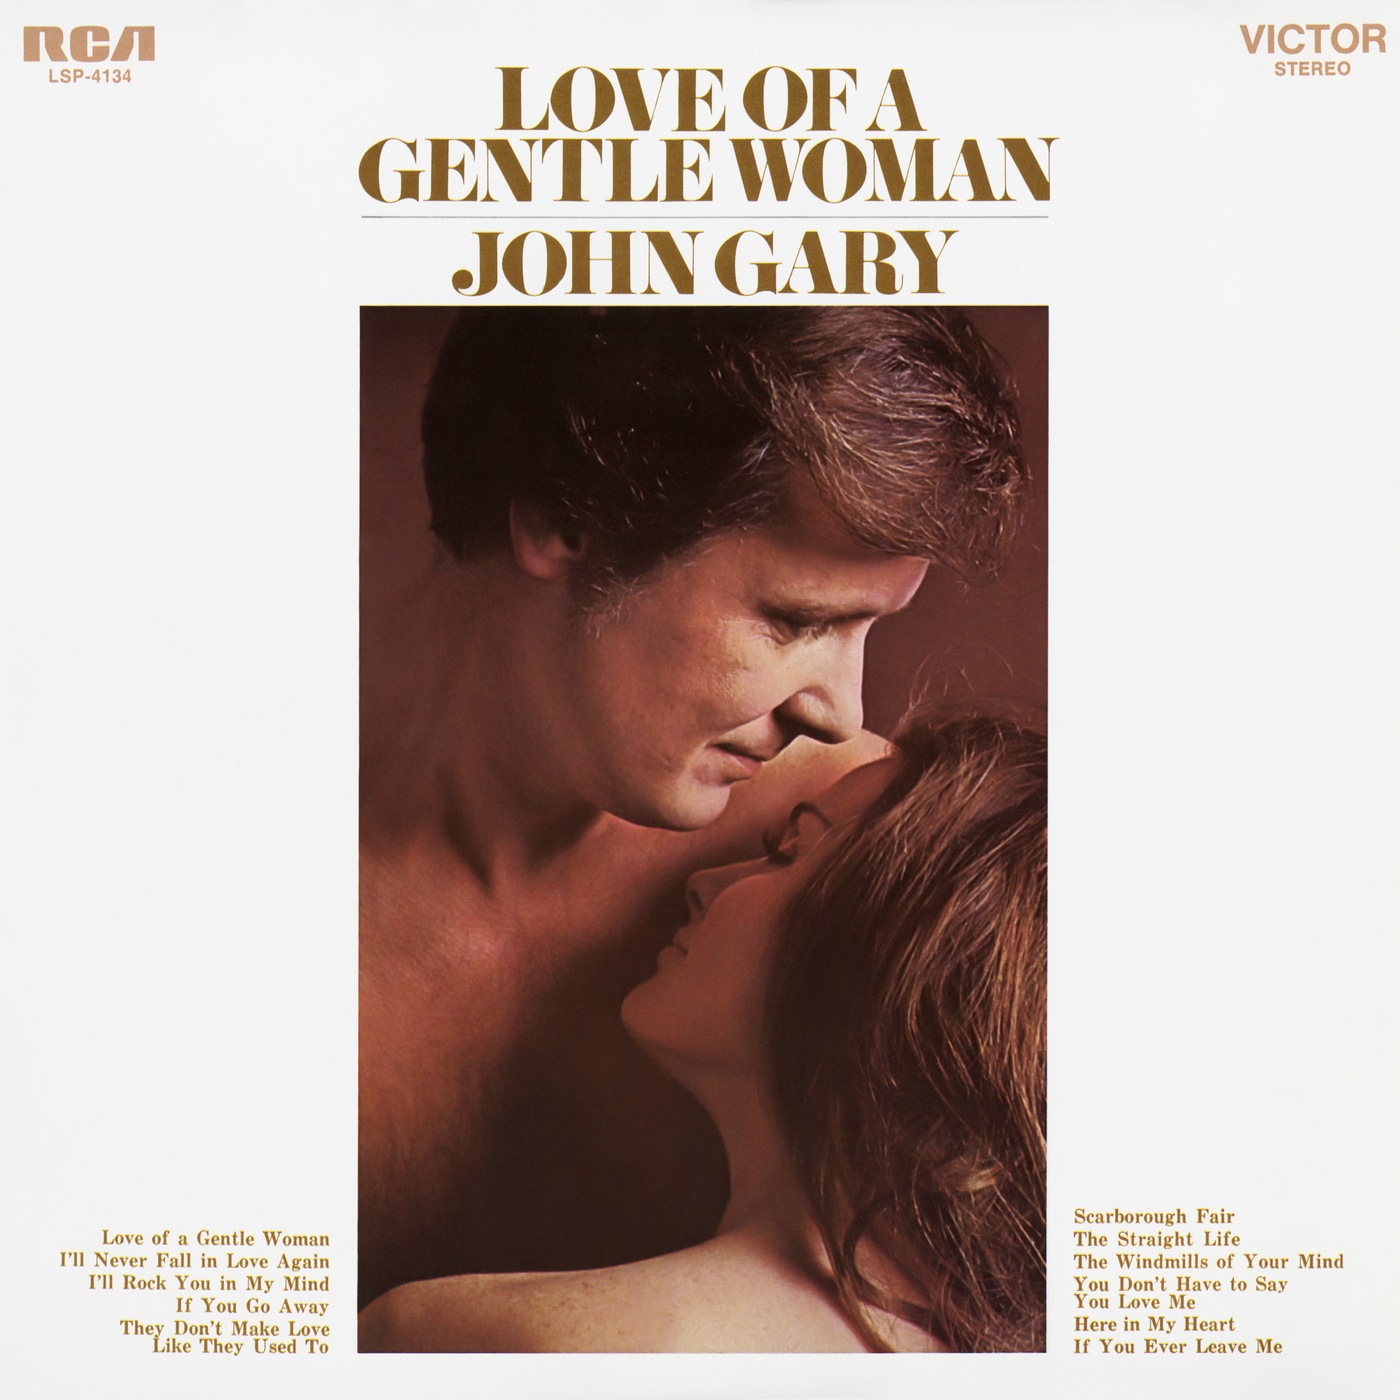 Love of a Gentle Woman - John Gary